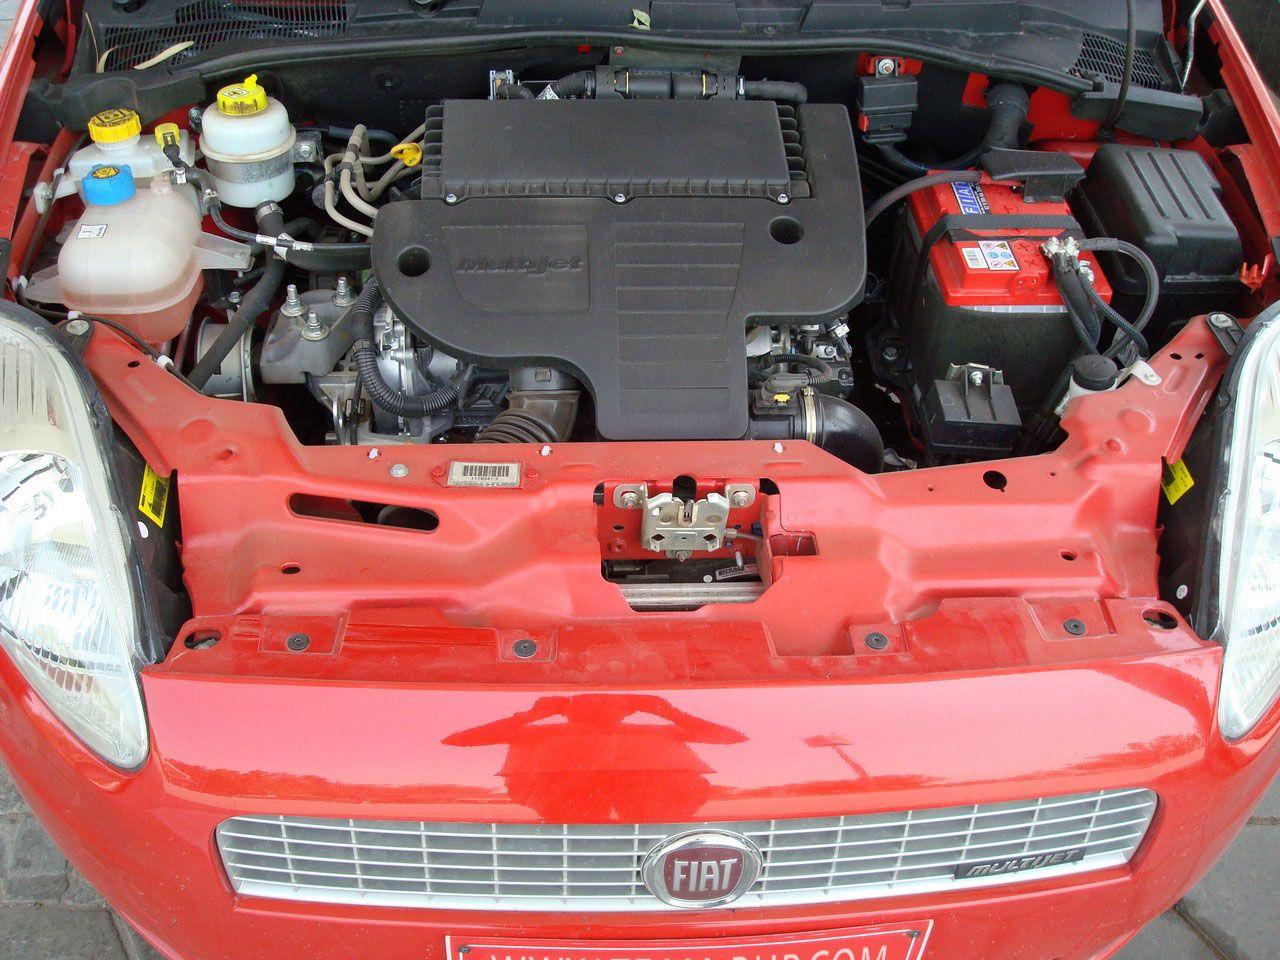 FIAT GRANDE PUNTO engine